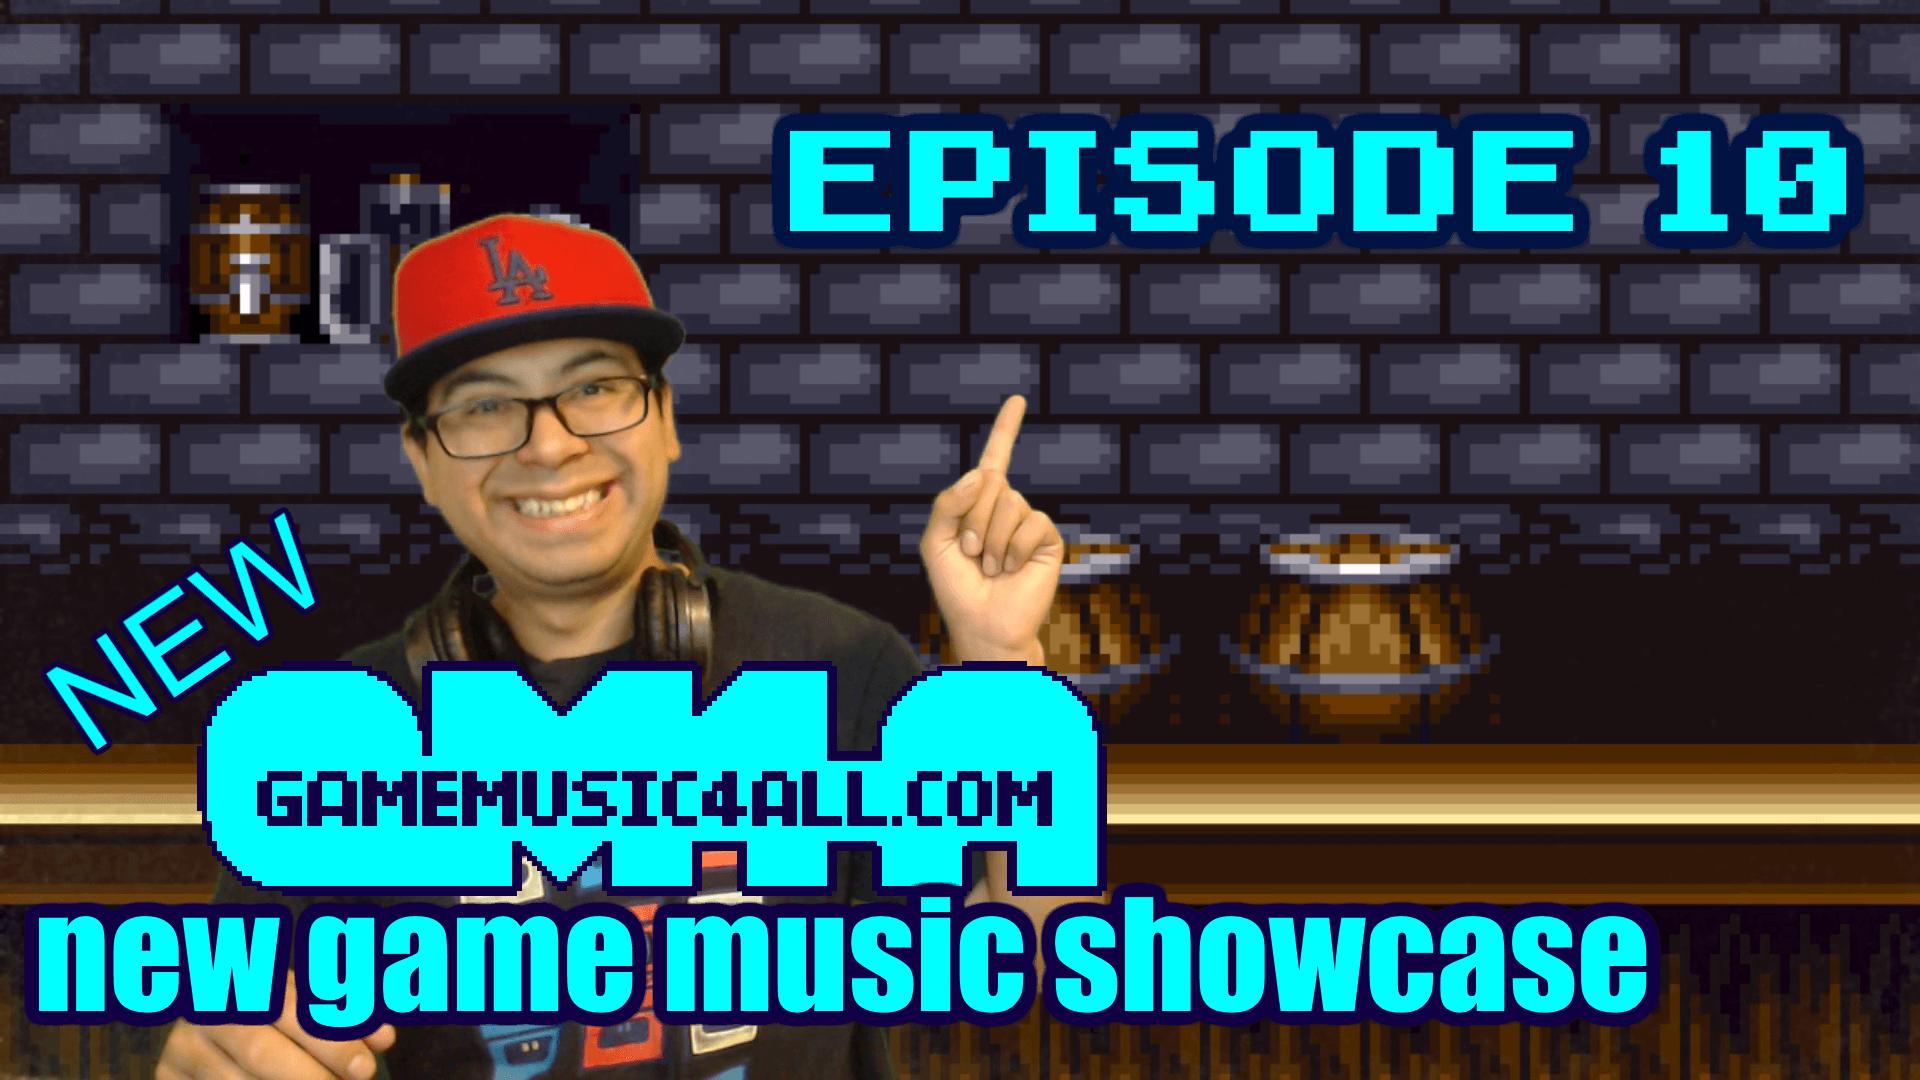 newgamemusicshowcase10.png